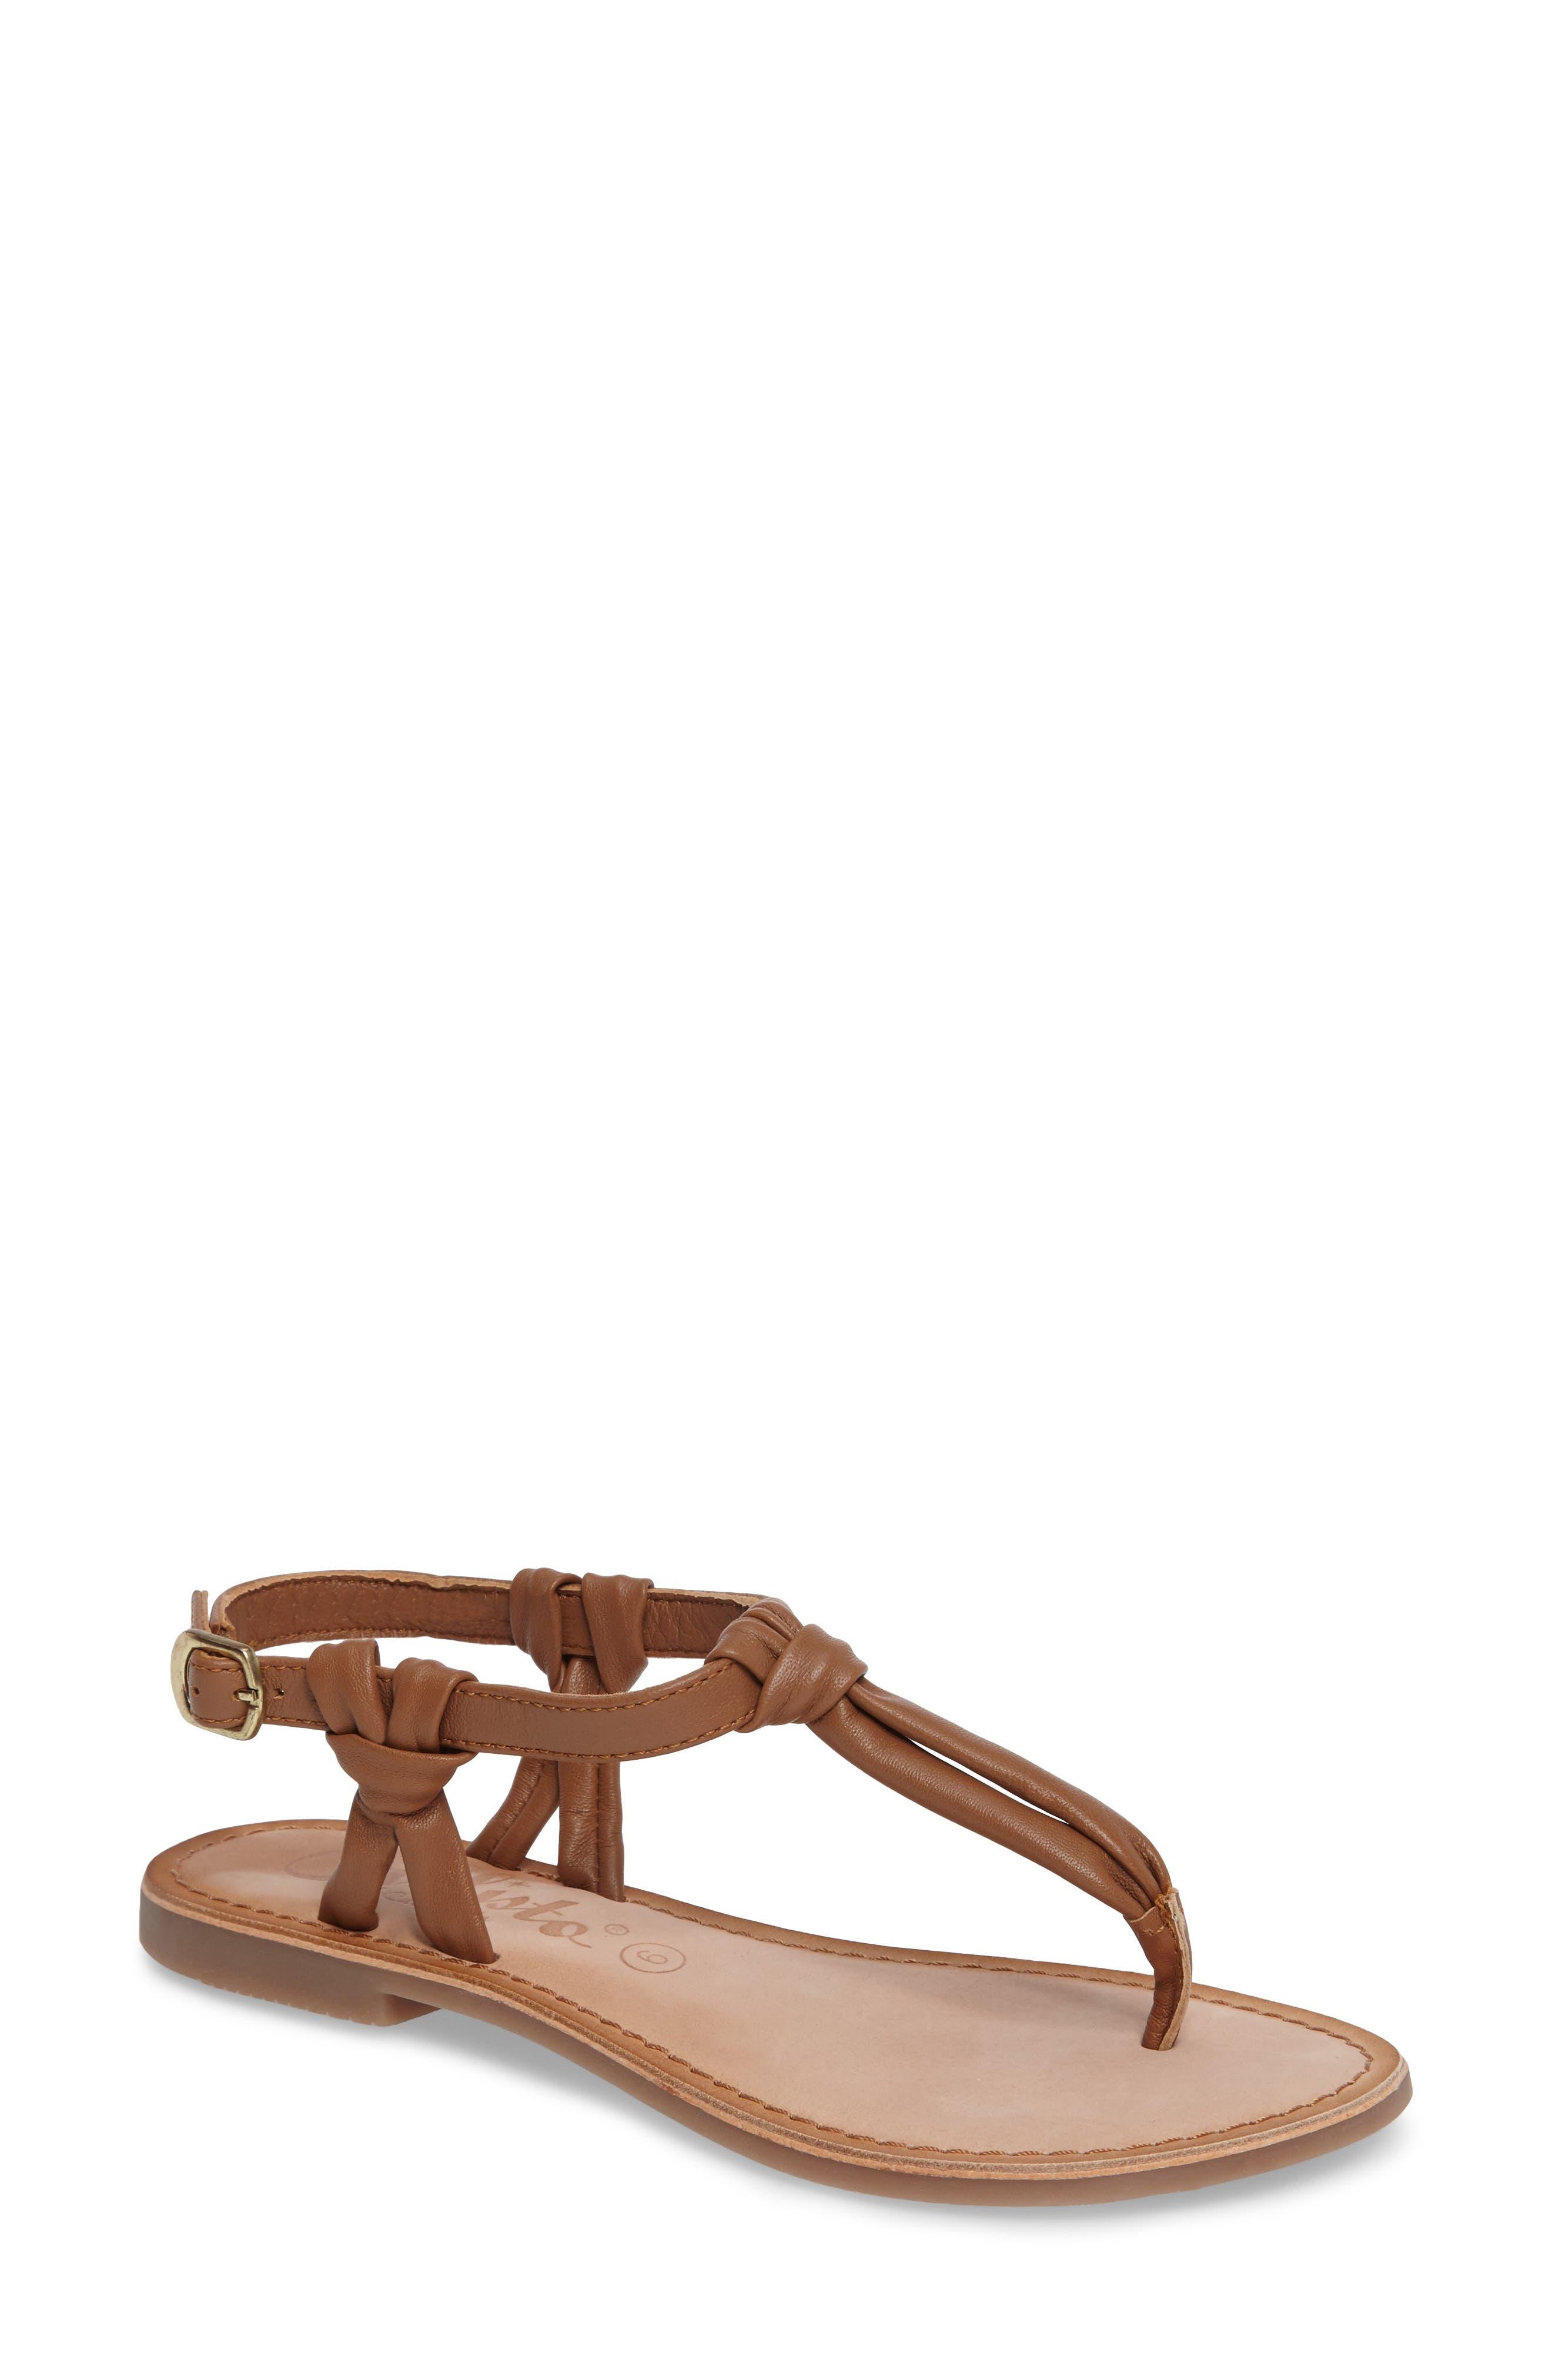 Alternate Image 1 Selected - Callisto Azza T-Strap Sandal (Women)